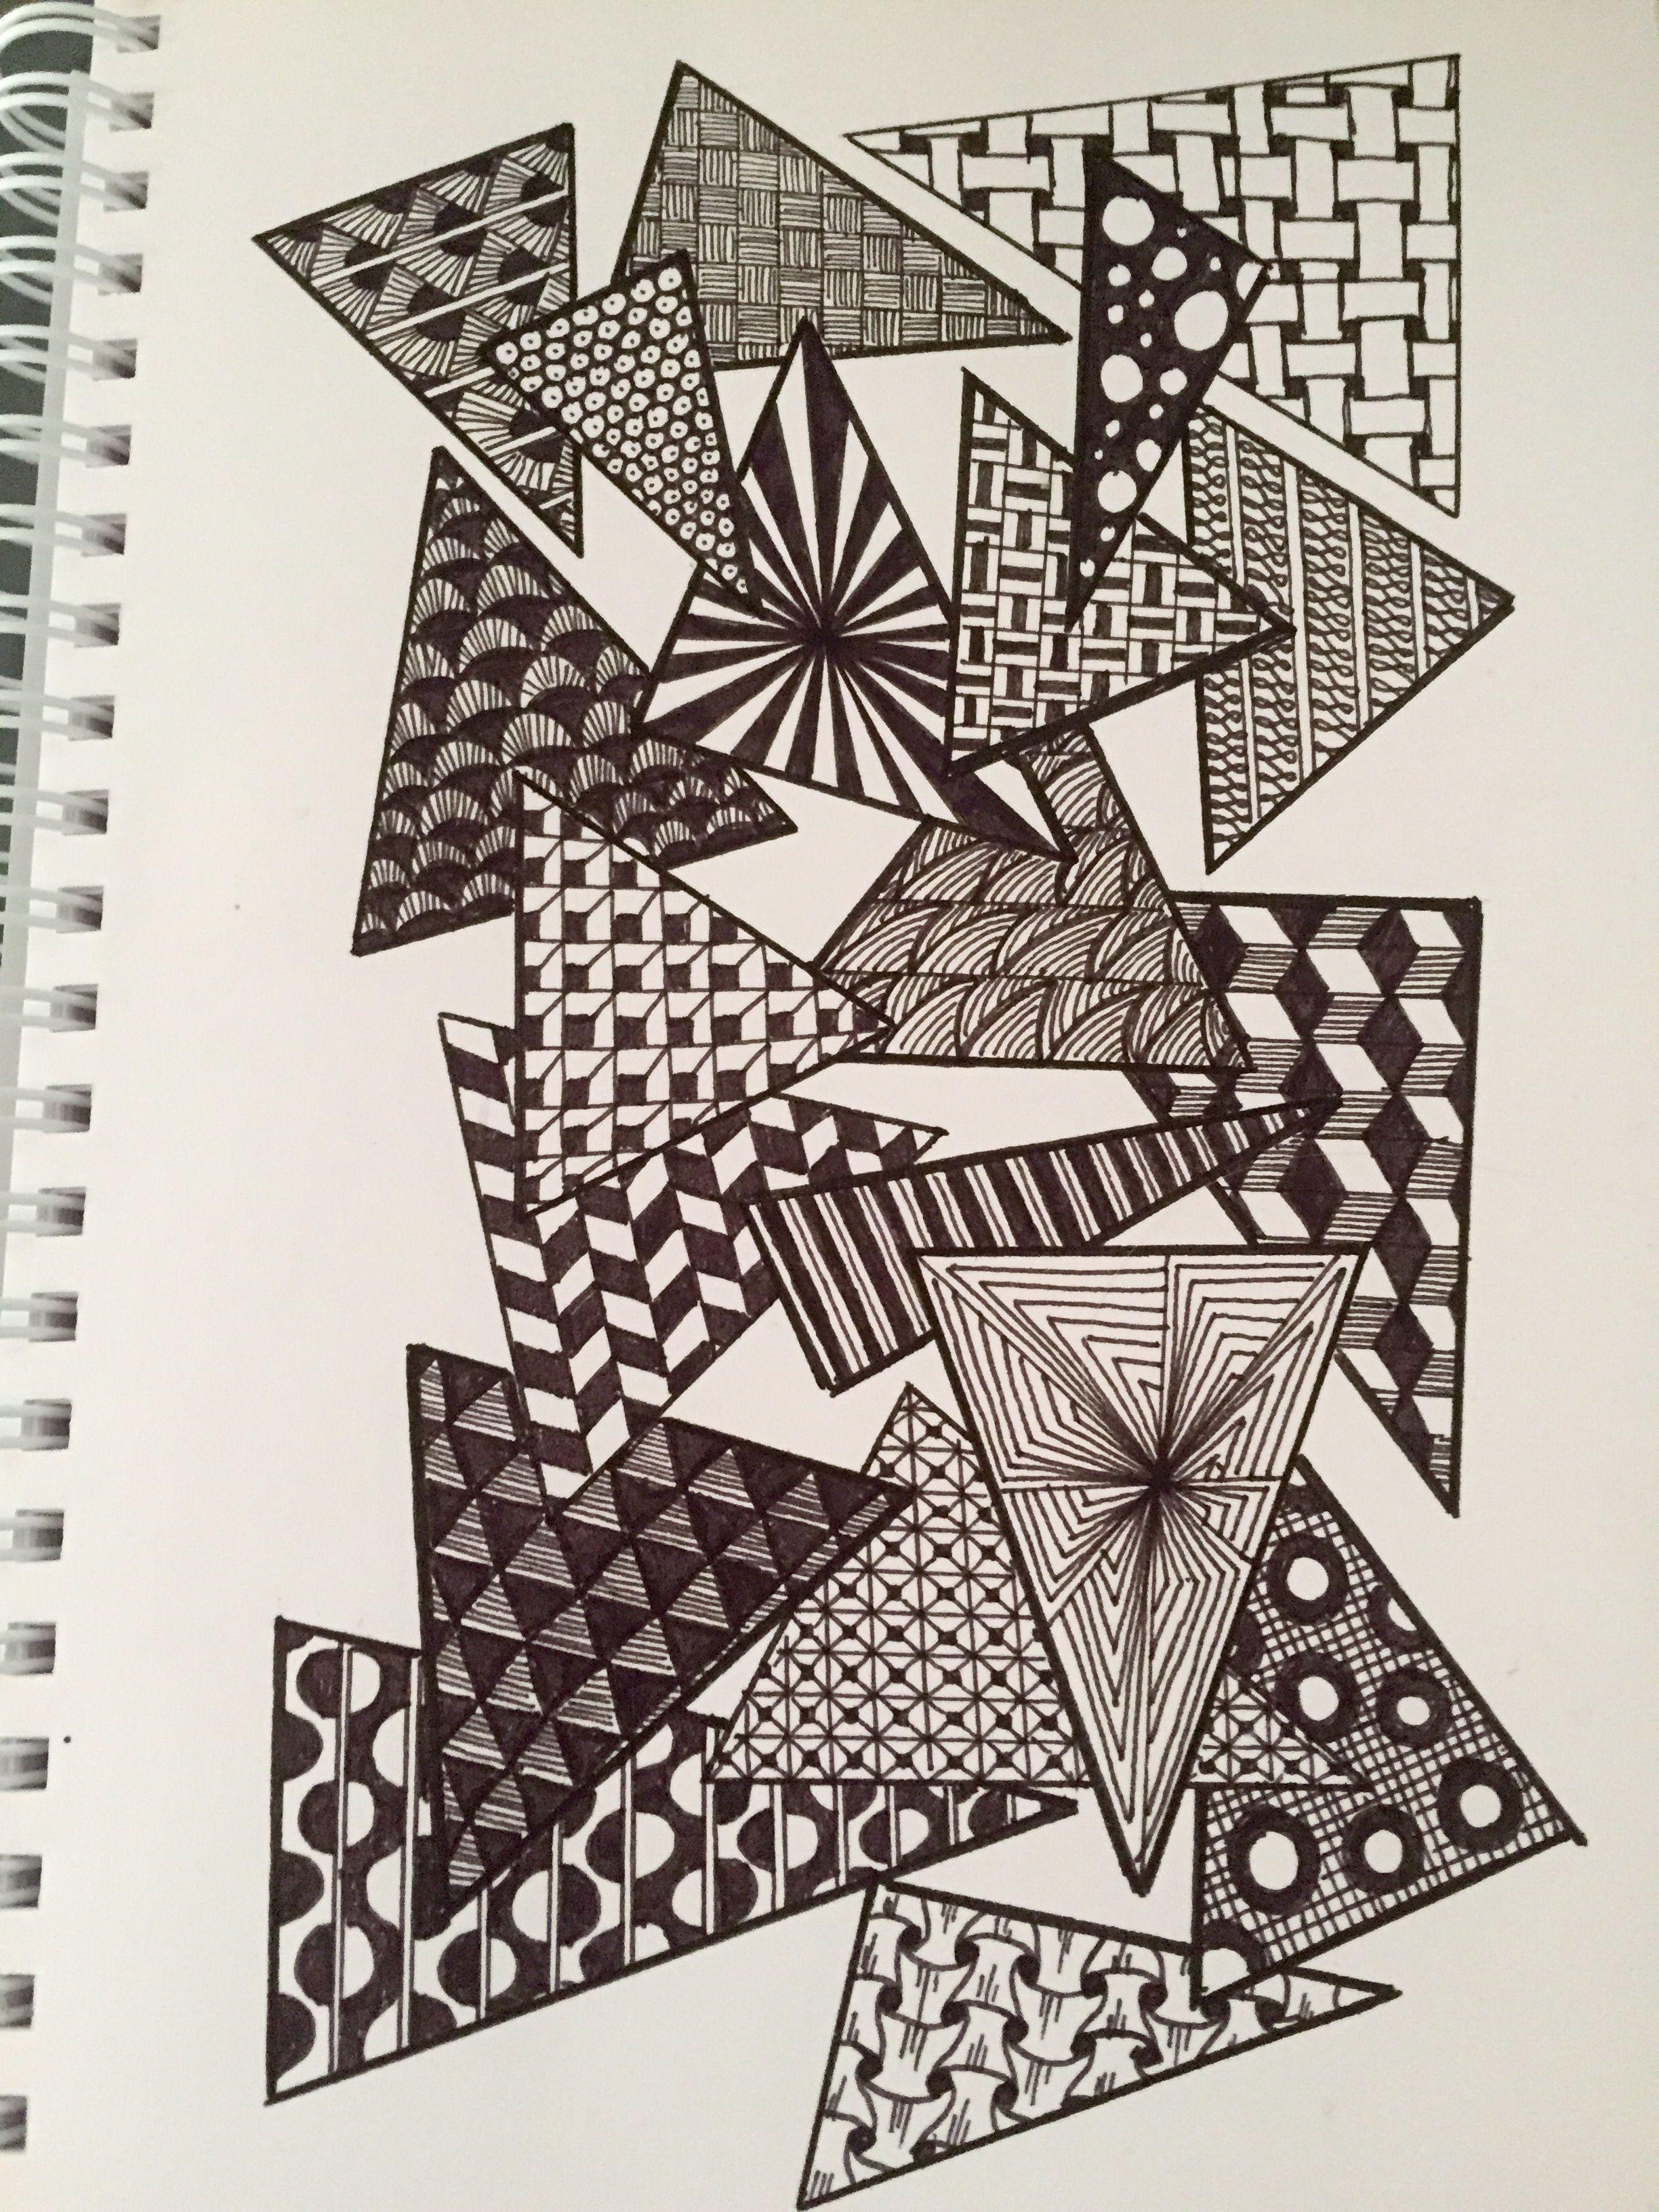 Pin By Ellie Noble On Doodles 2020 Zentangle Patterns Mandala